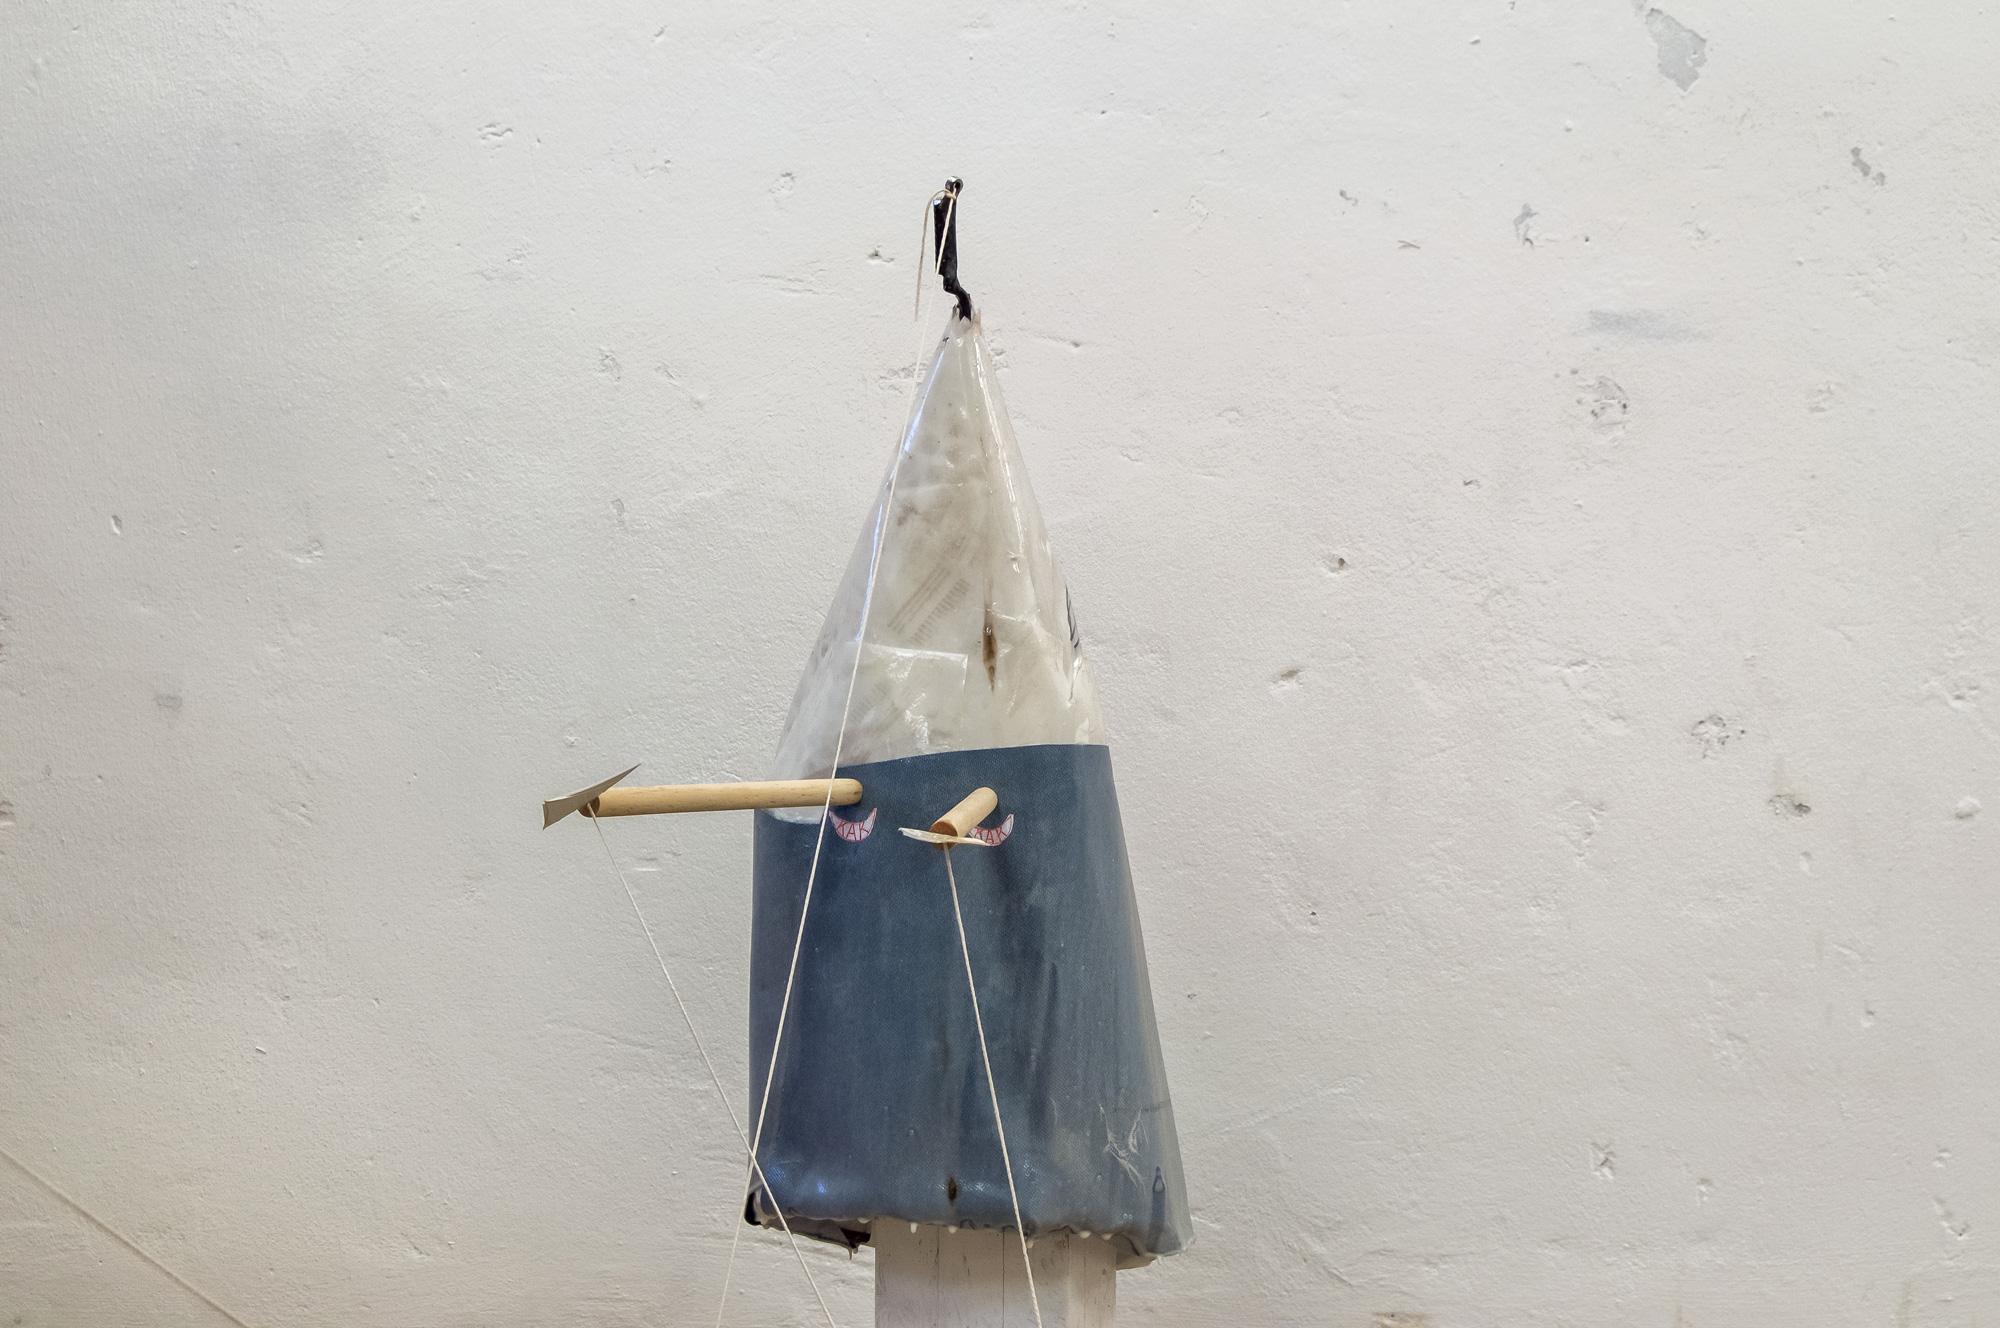 OP │ metal, wood, plastic, cardboard, paper, fabric │ 2019 │ 100cm x 210cm x 40cm